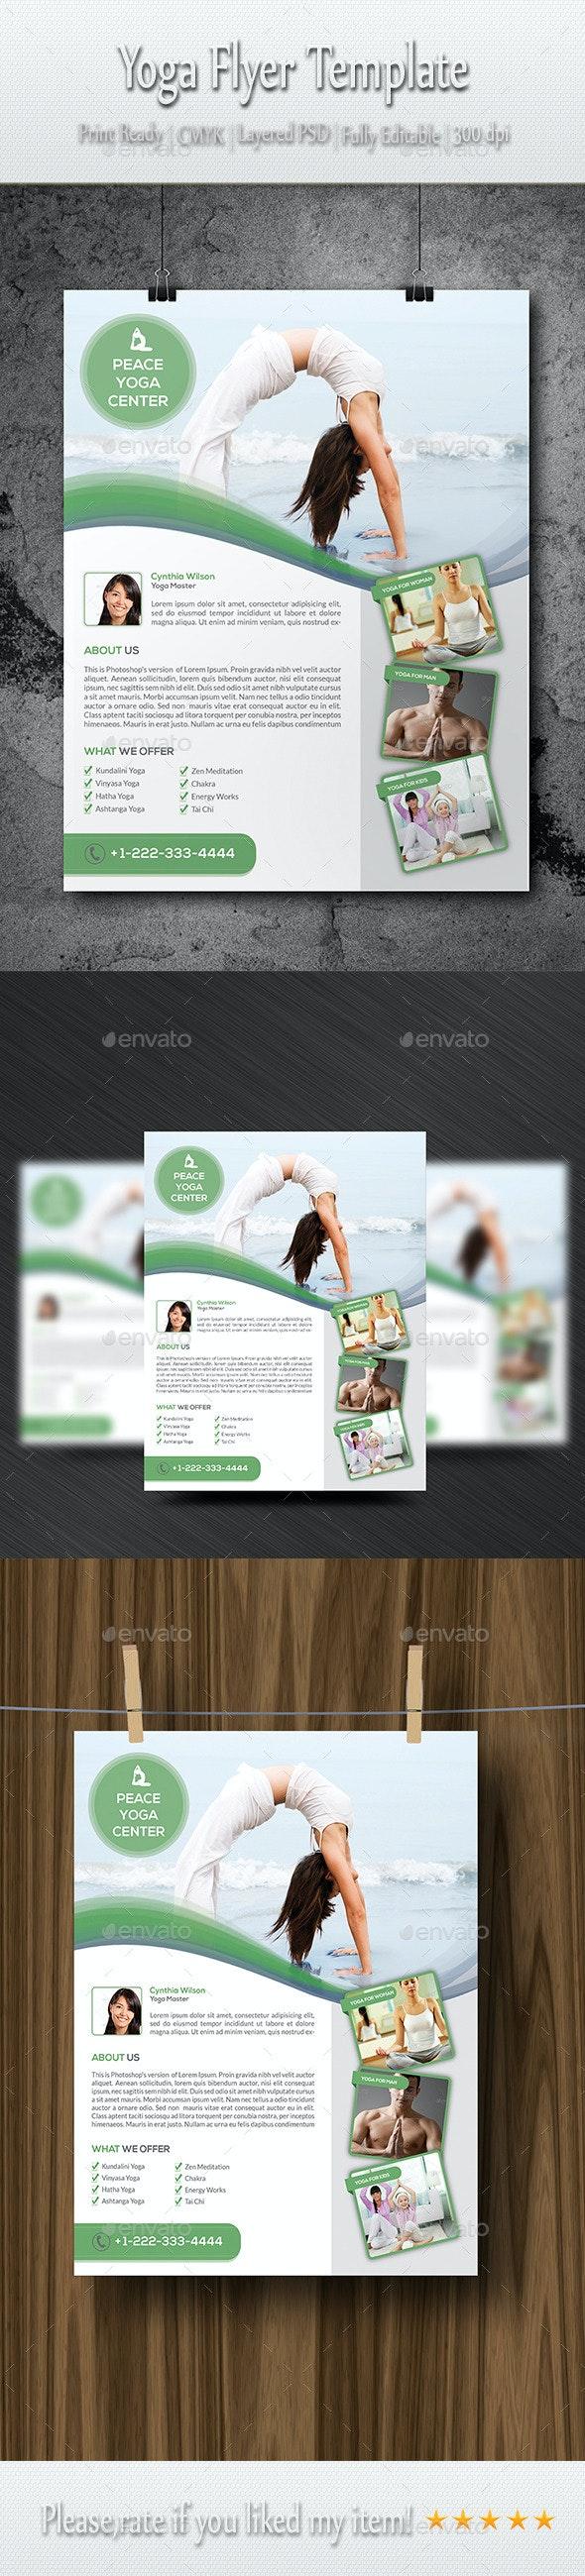 Yoga Flyer Template - Commerce Flyers